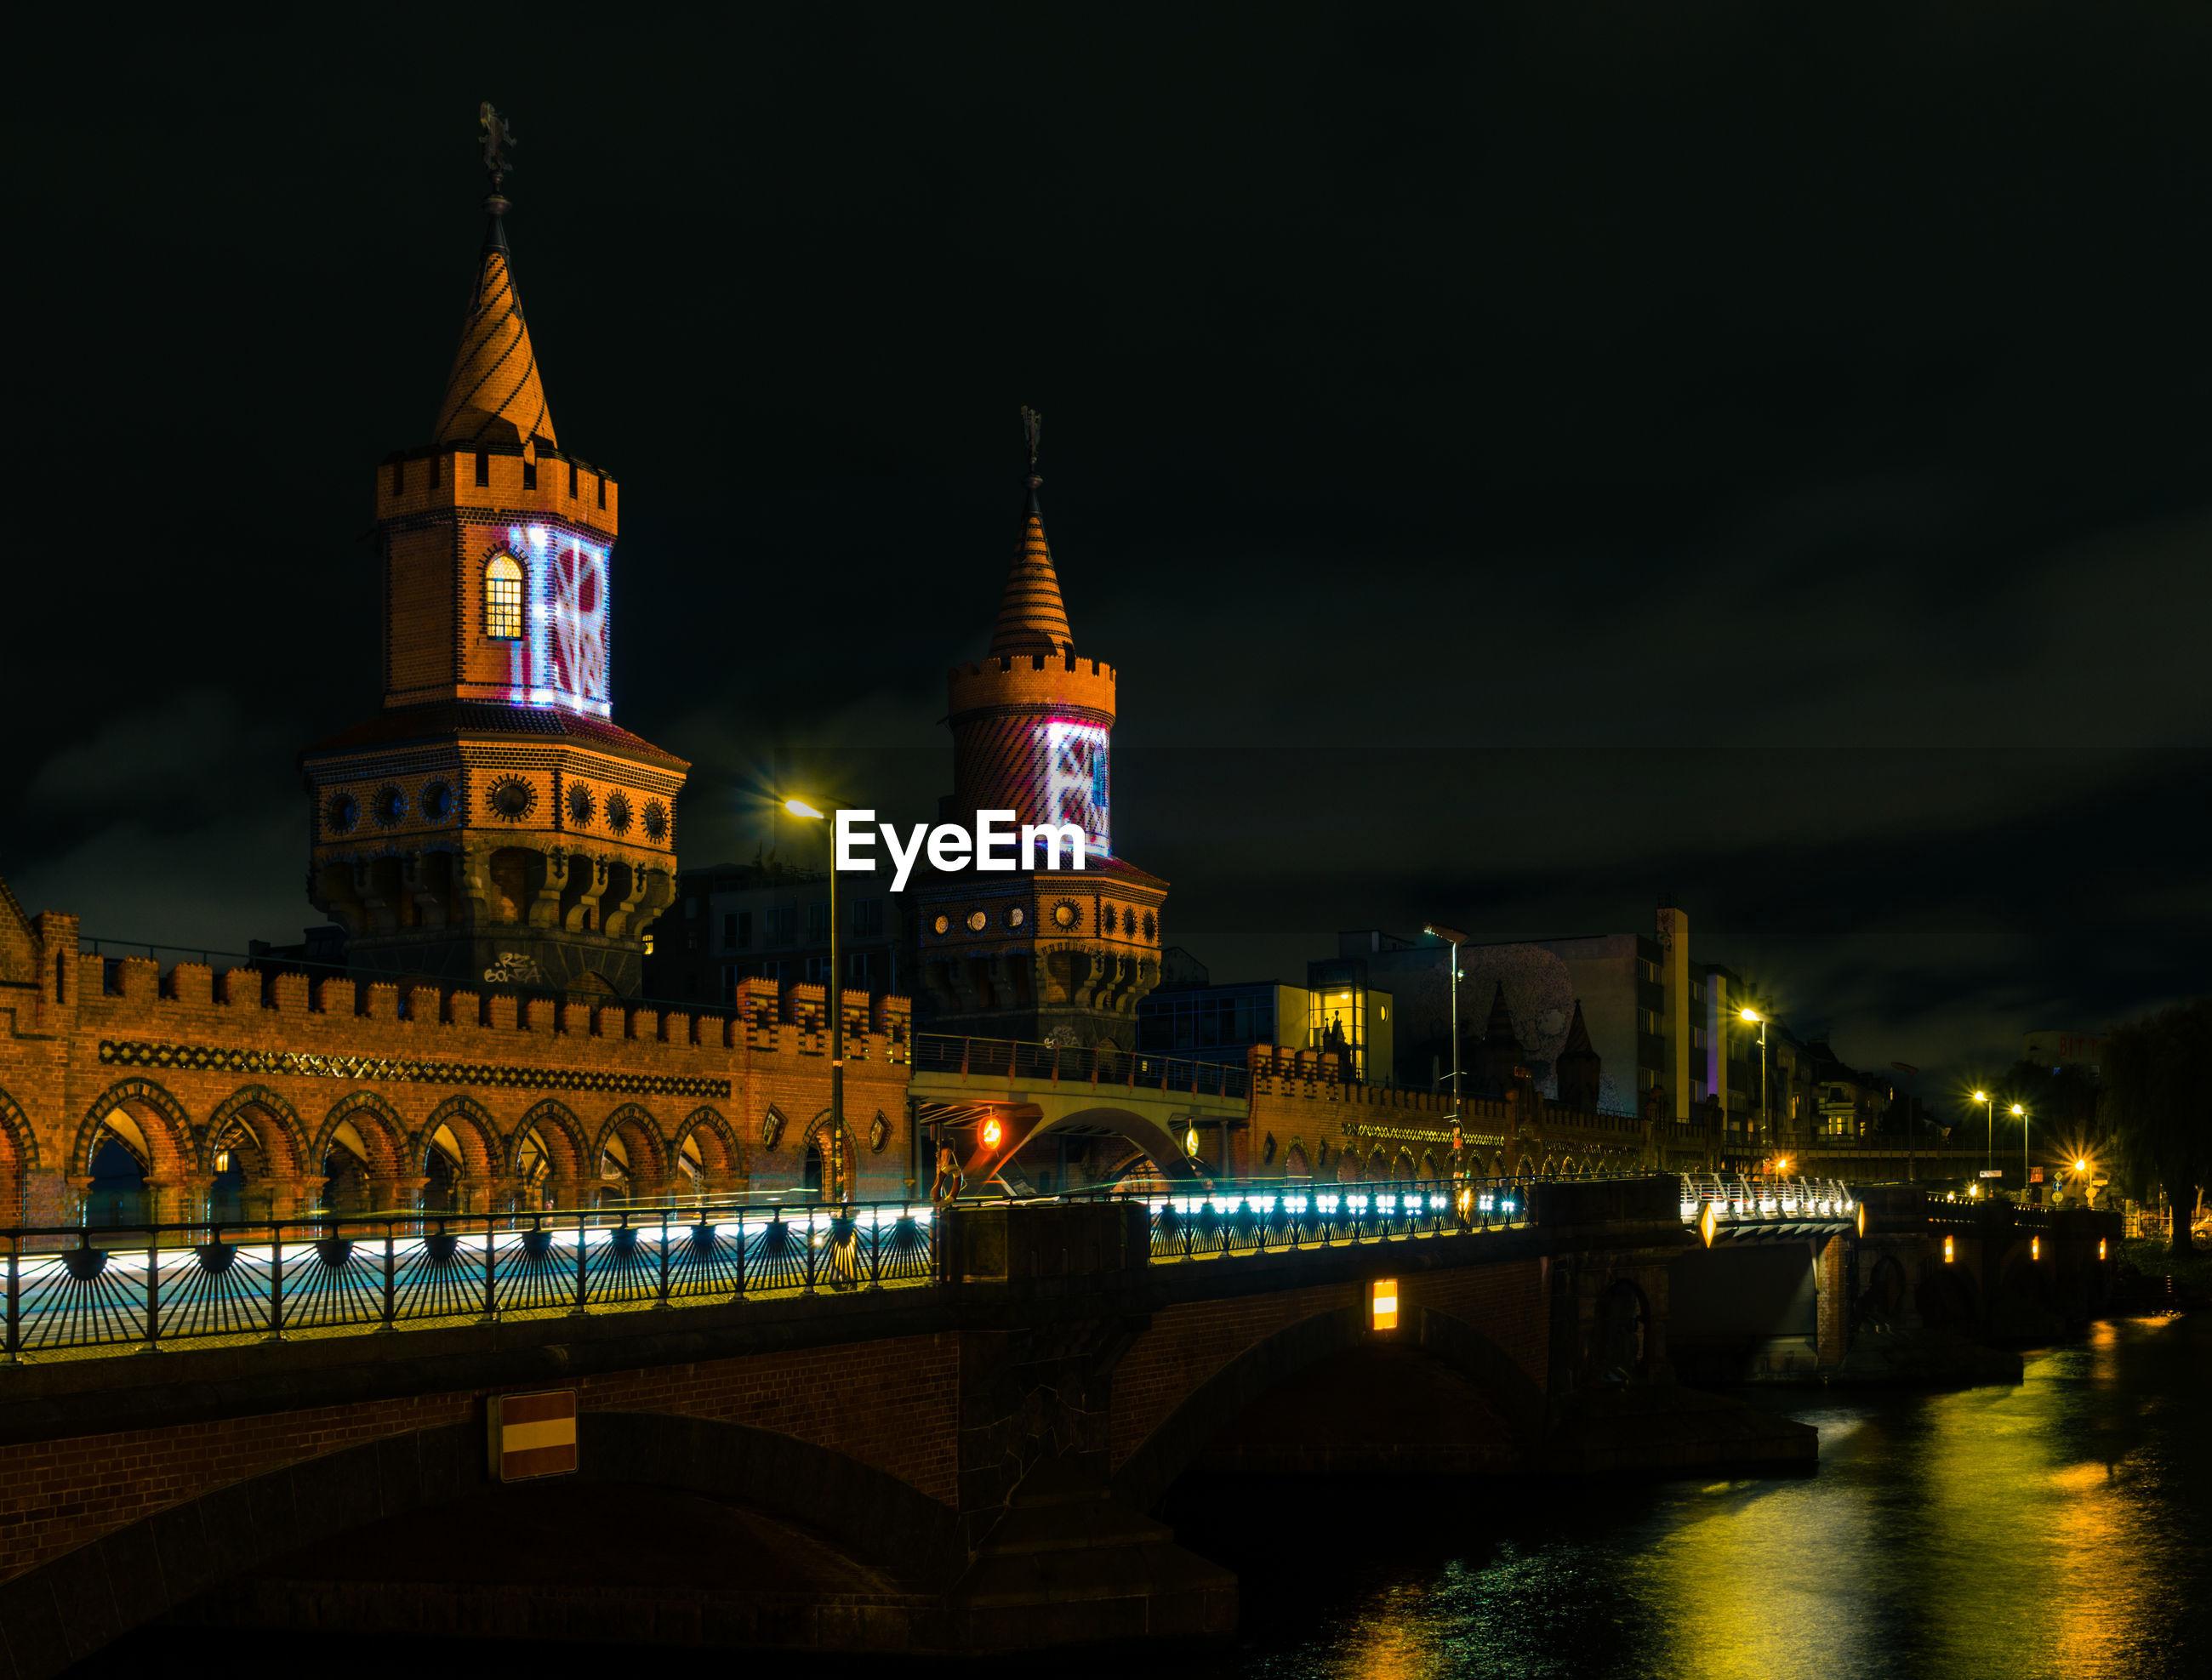 Oberbaum bridge over spree river against sky at night